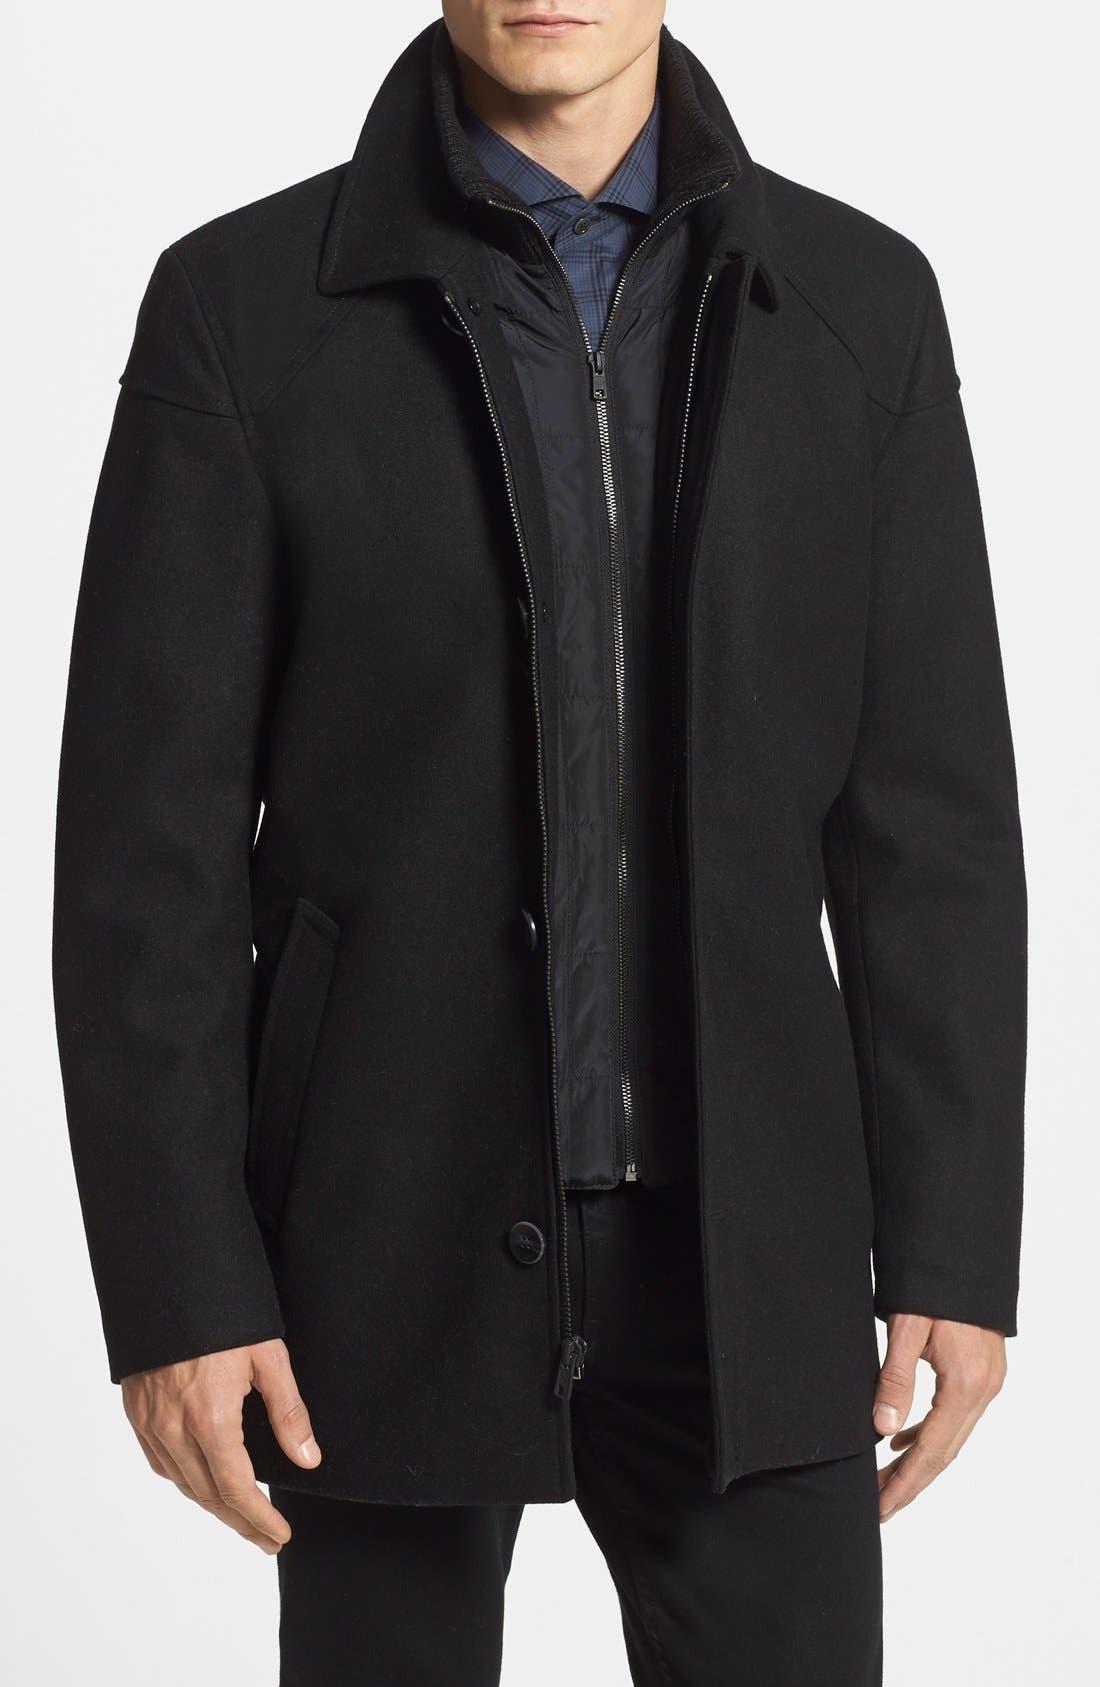 Melton Car Coat with Removable Bib,                         Main,                         color, Black